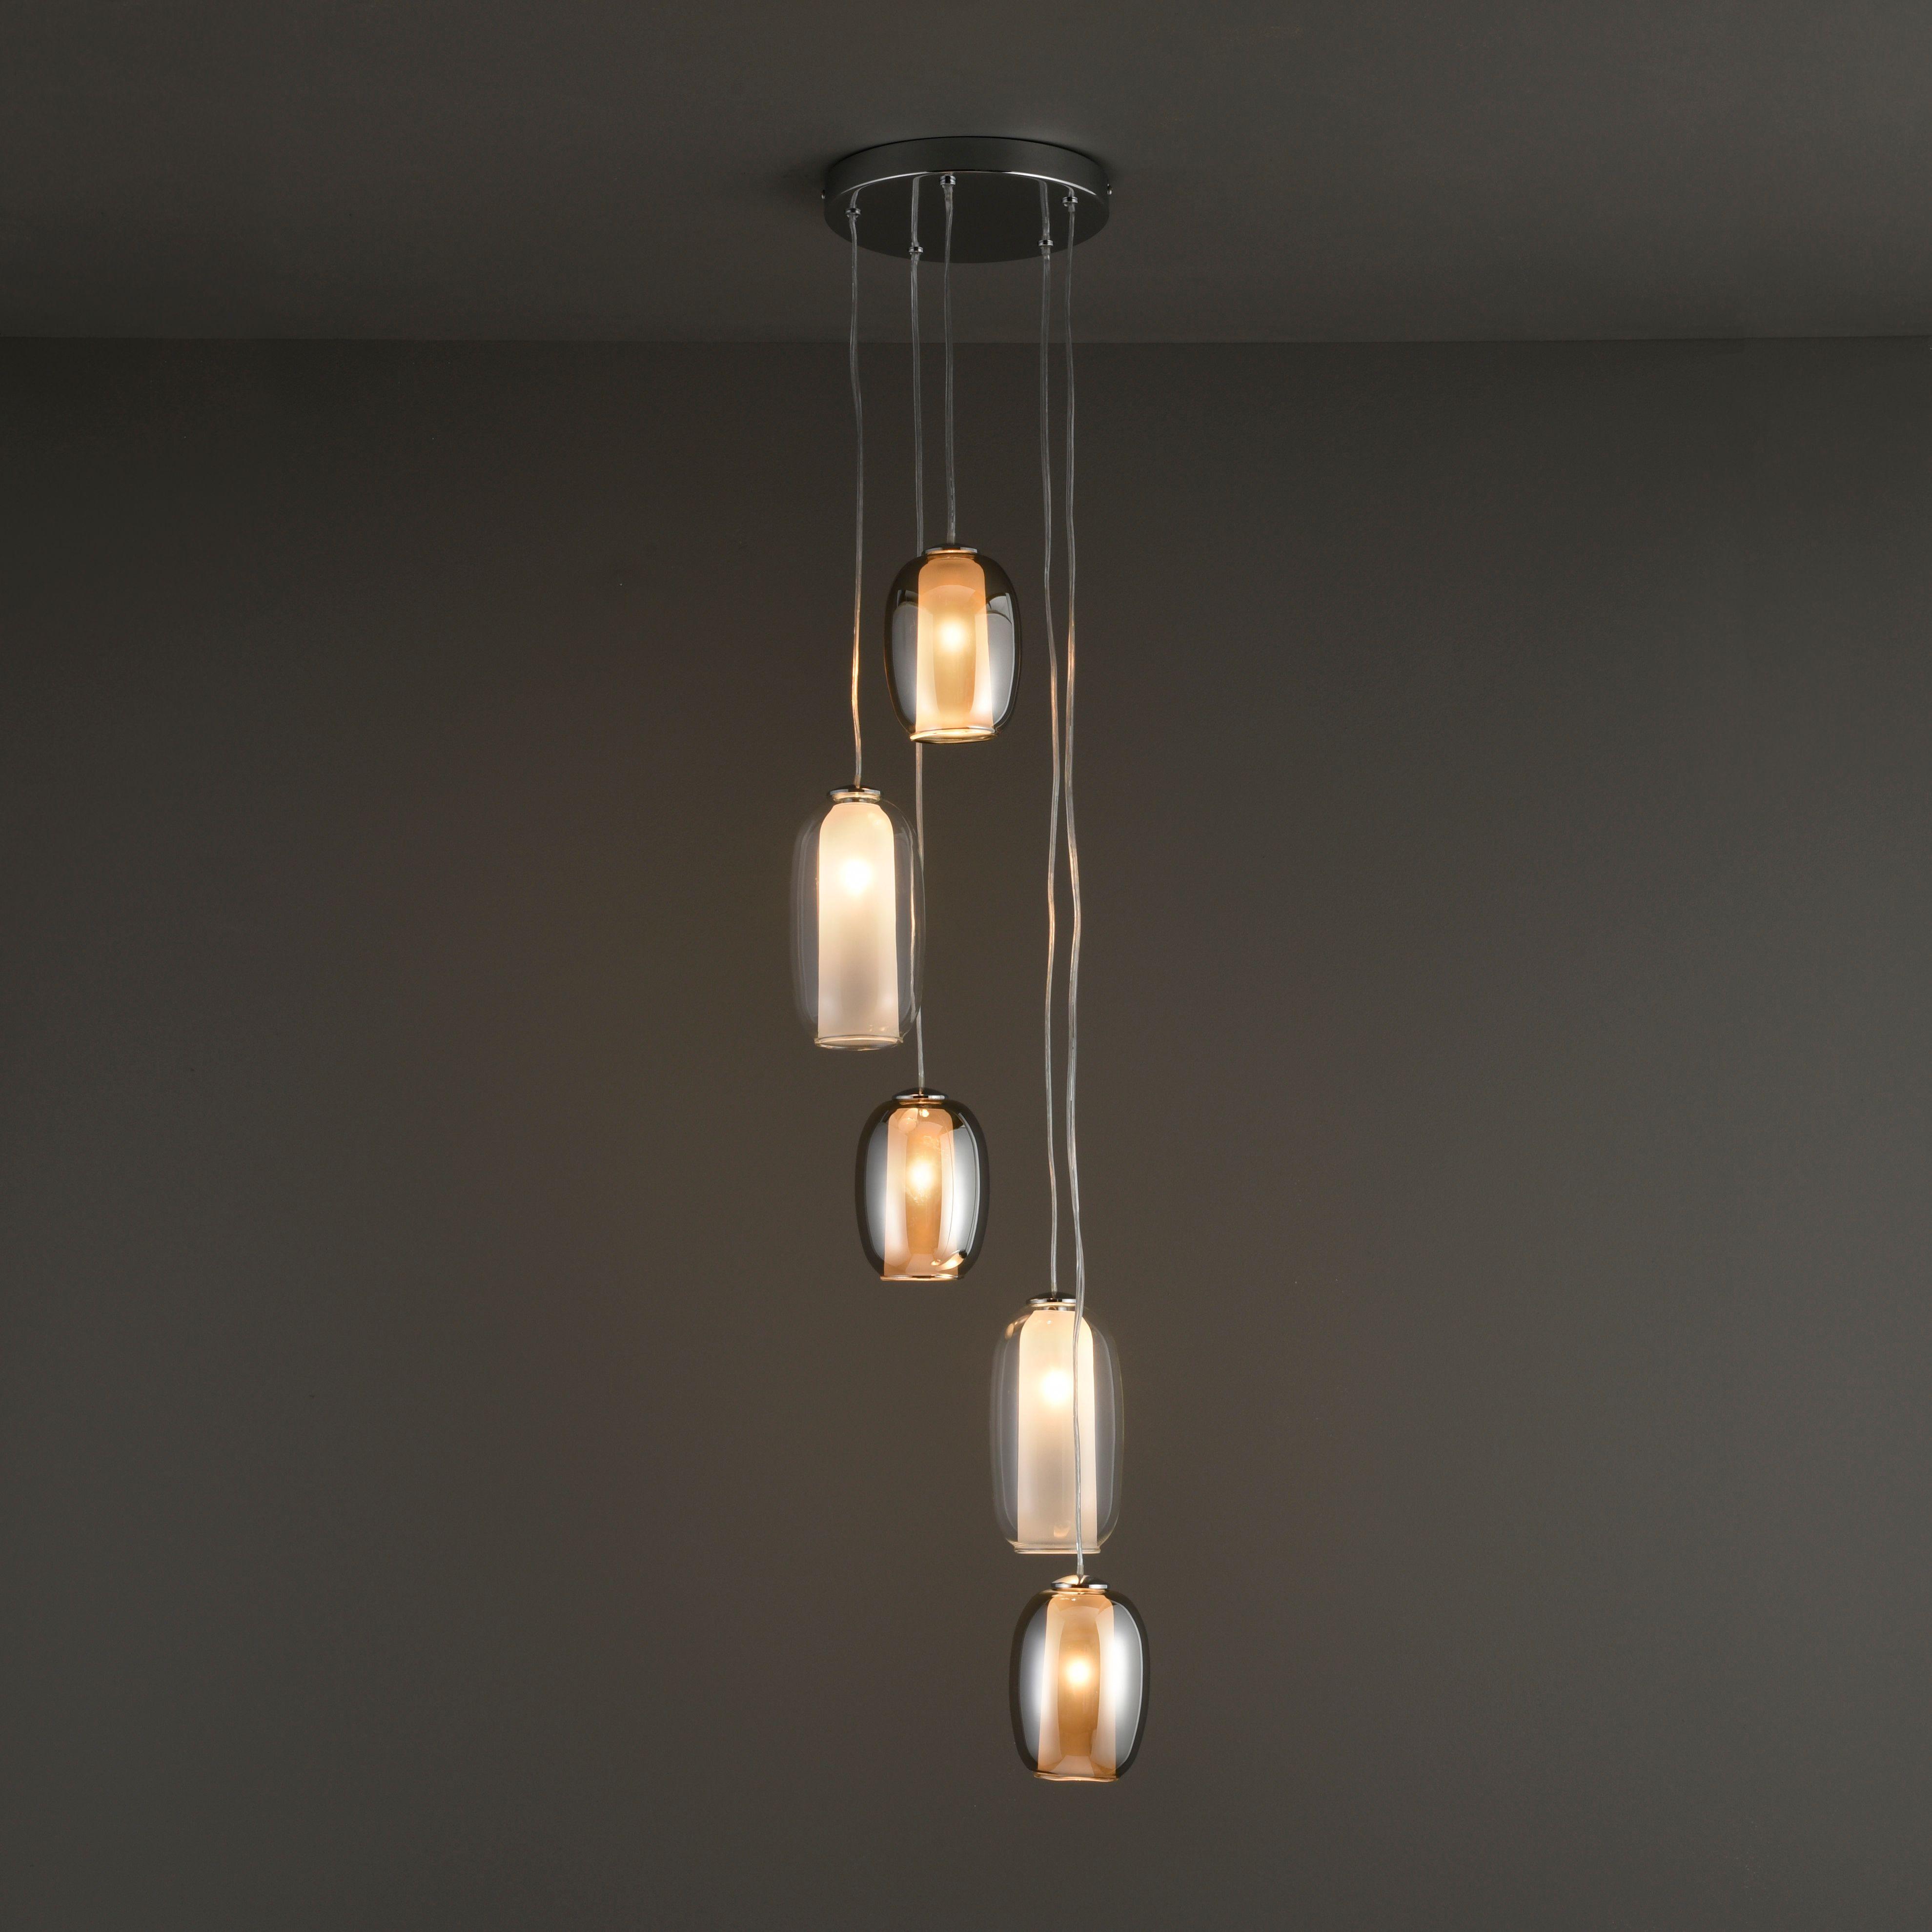 Agna Modern Smokey Grey Lustre 5 Lamp Ceiling